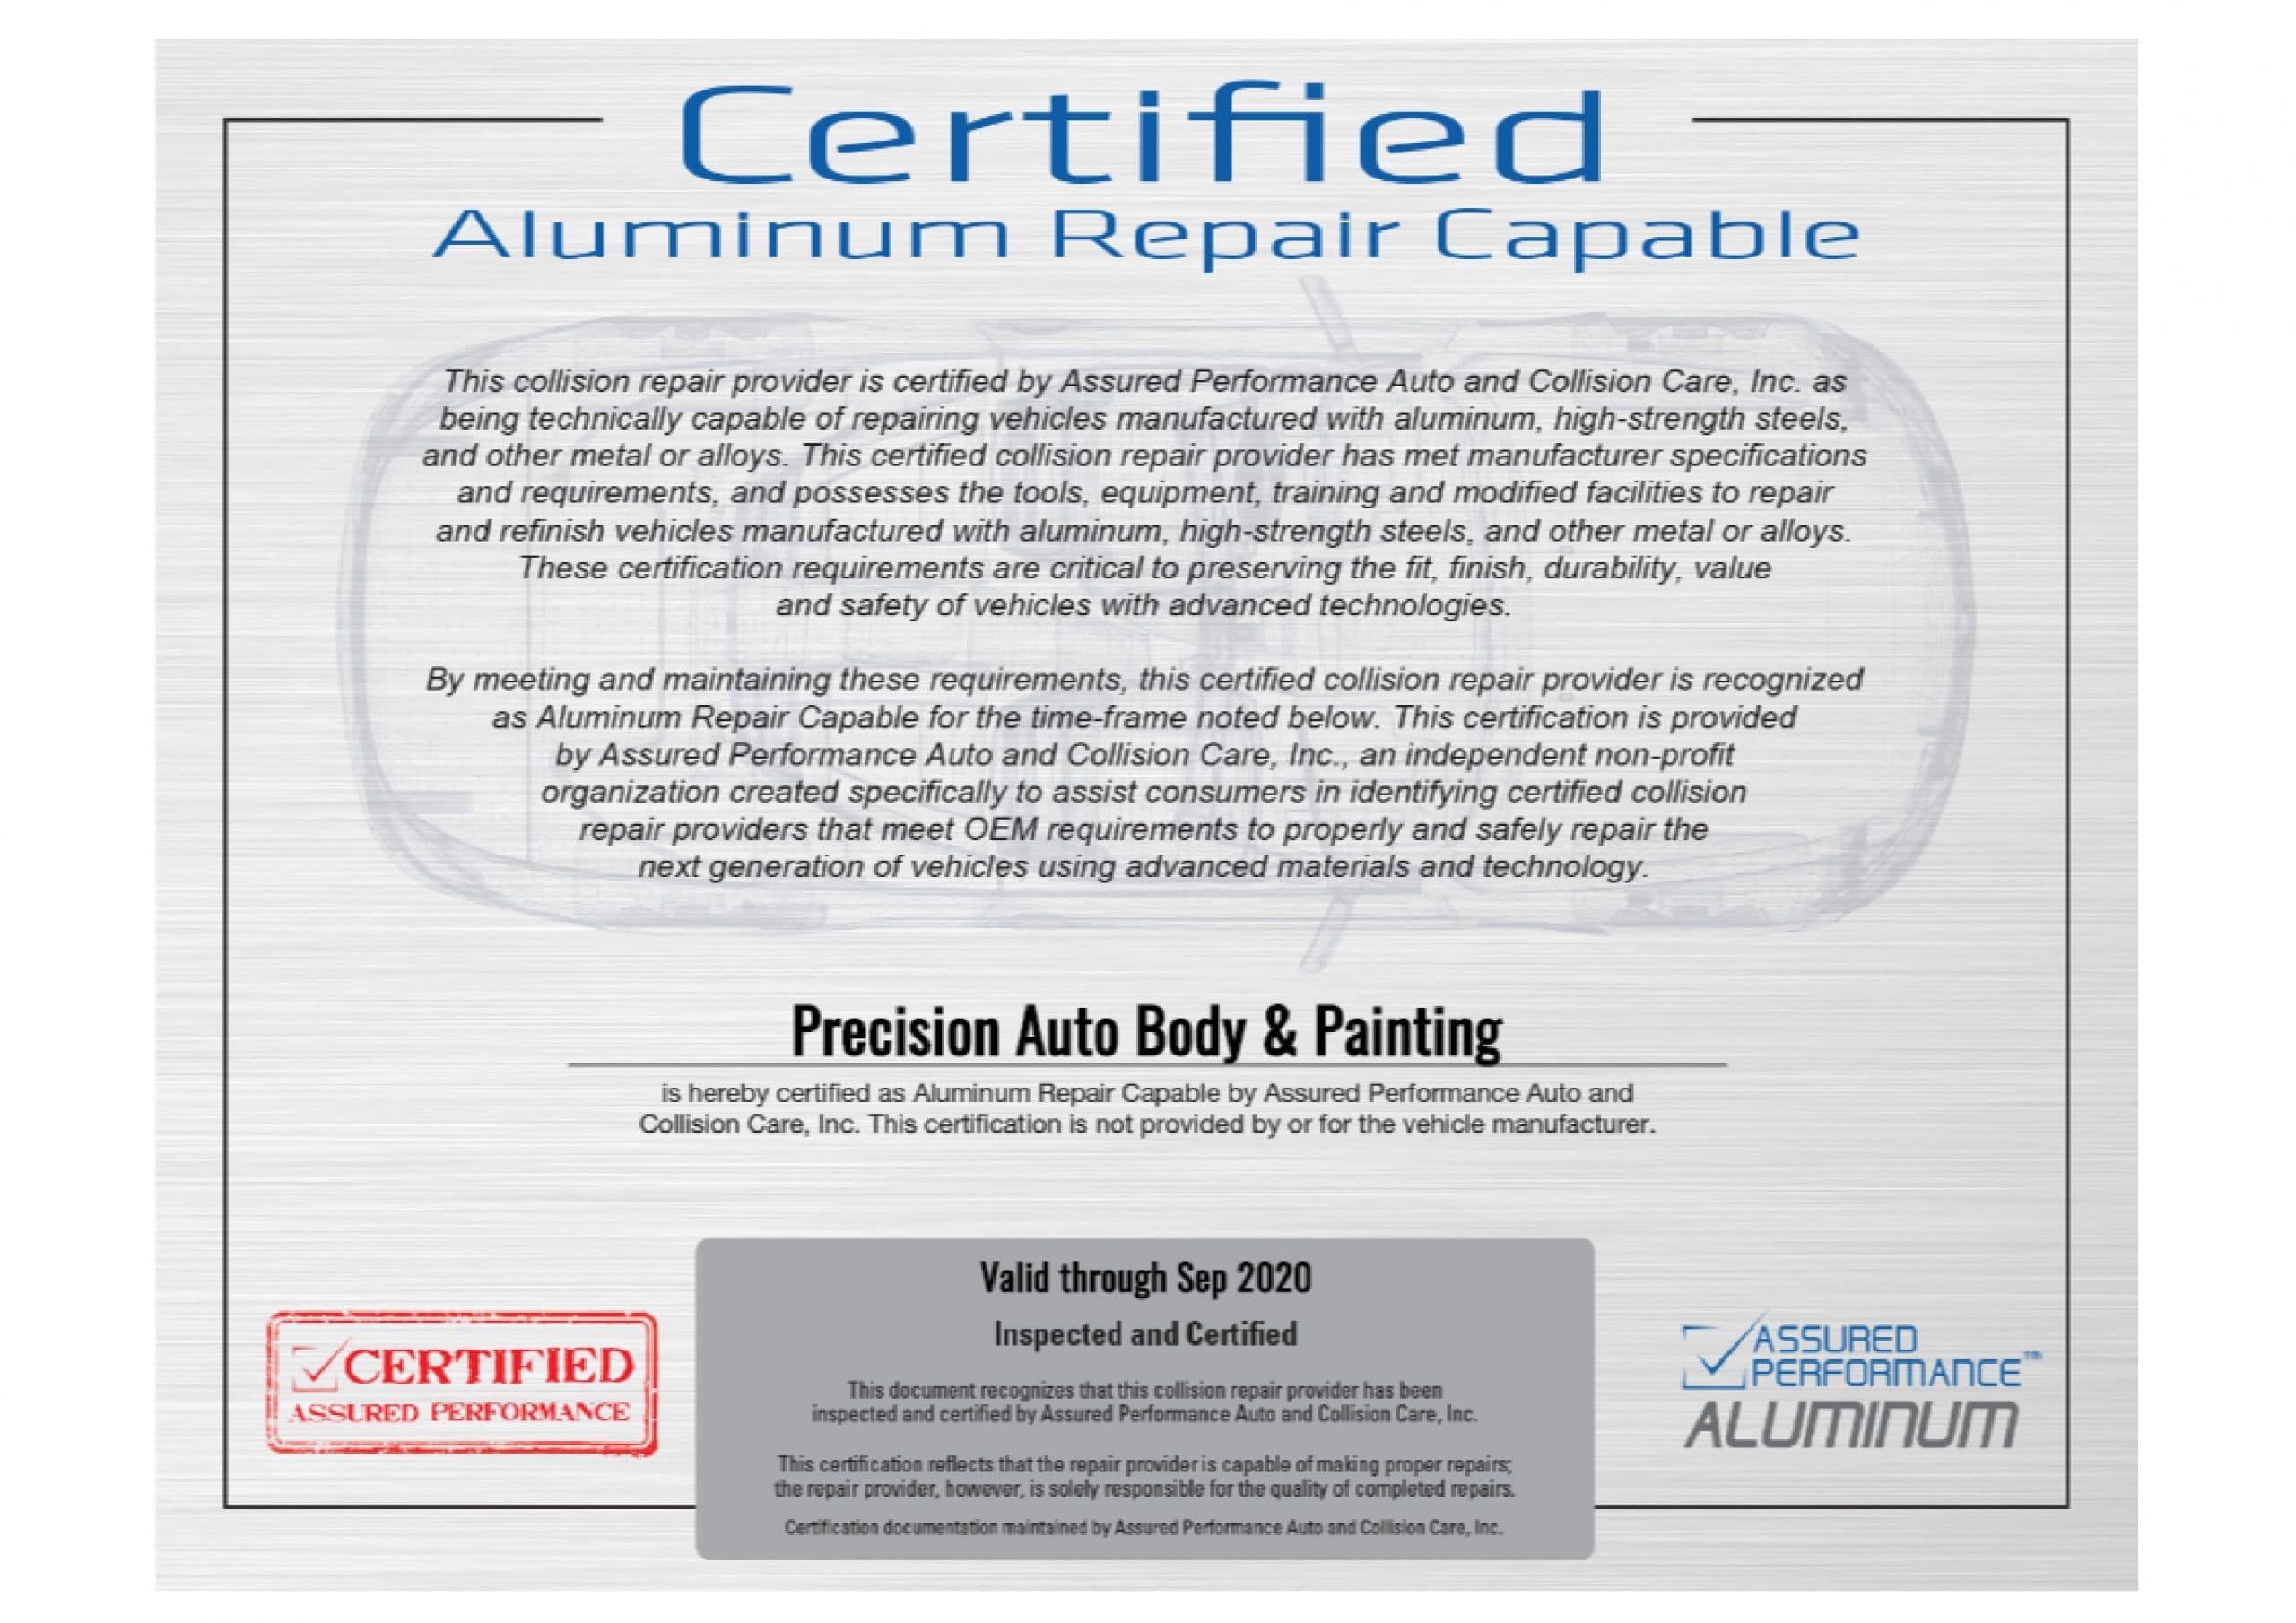 Certified by Assured Performance, Tesla, Mercedes-Benz USA, FCA, Nissan, Infiniti, Hyundai, Kia, Ford